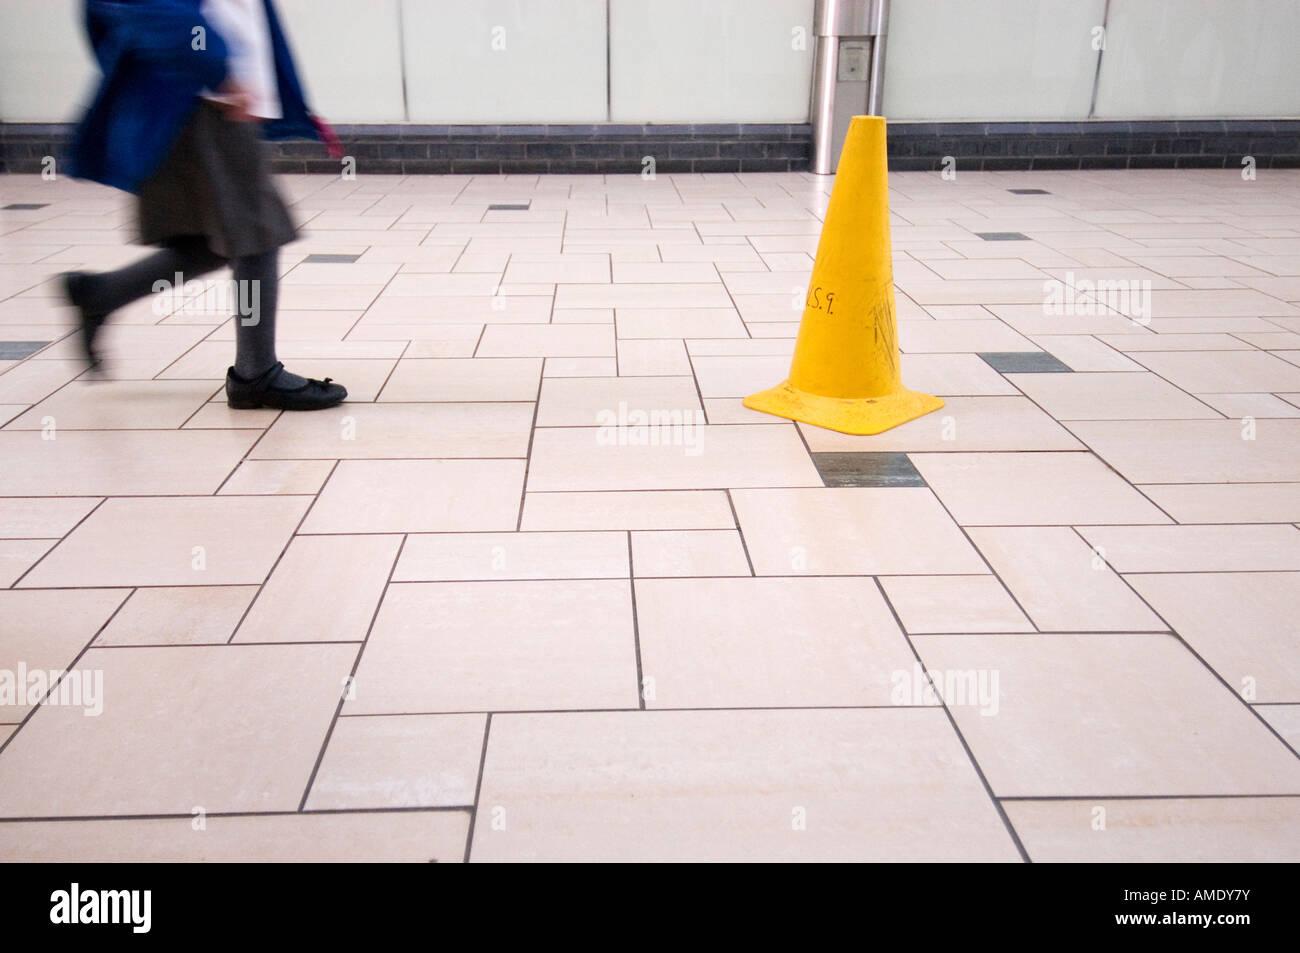 slippery floor in shopping mall - Stock Image